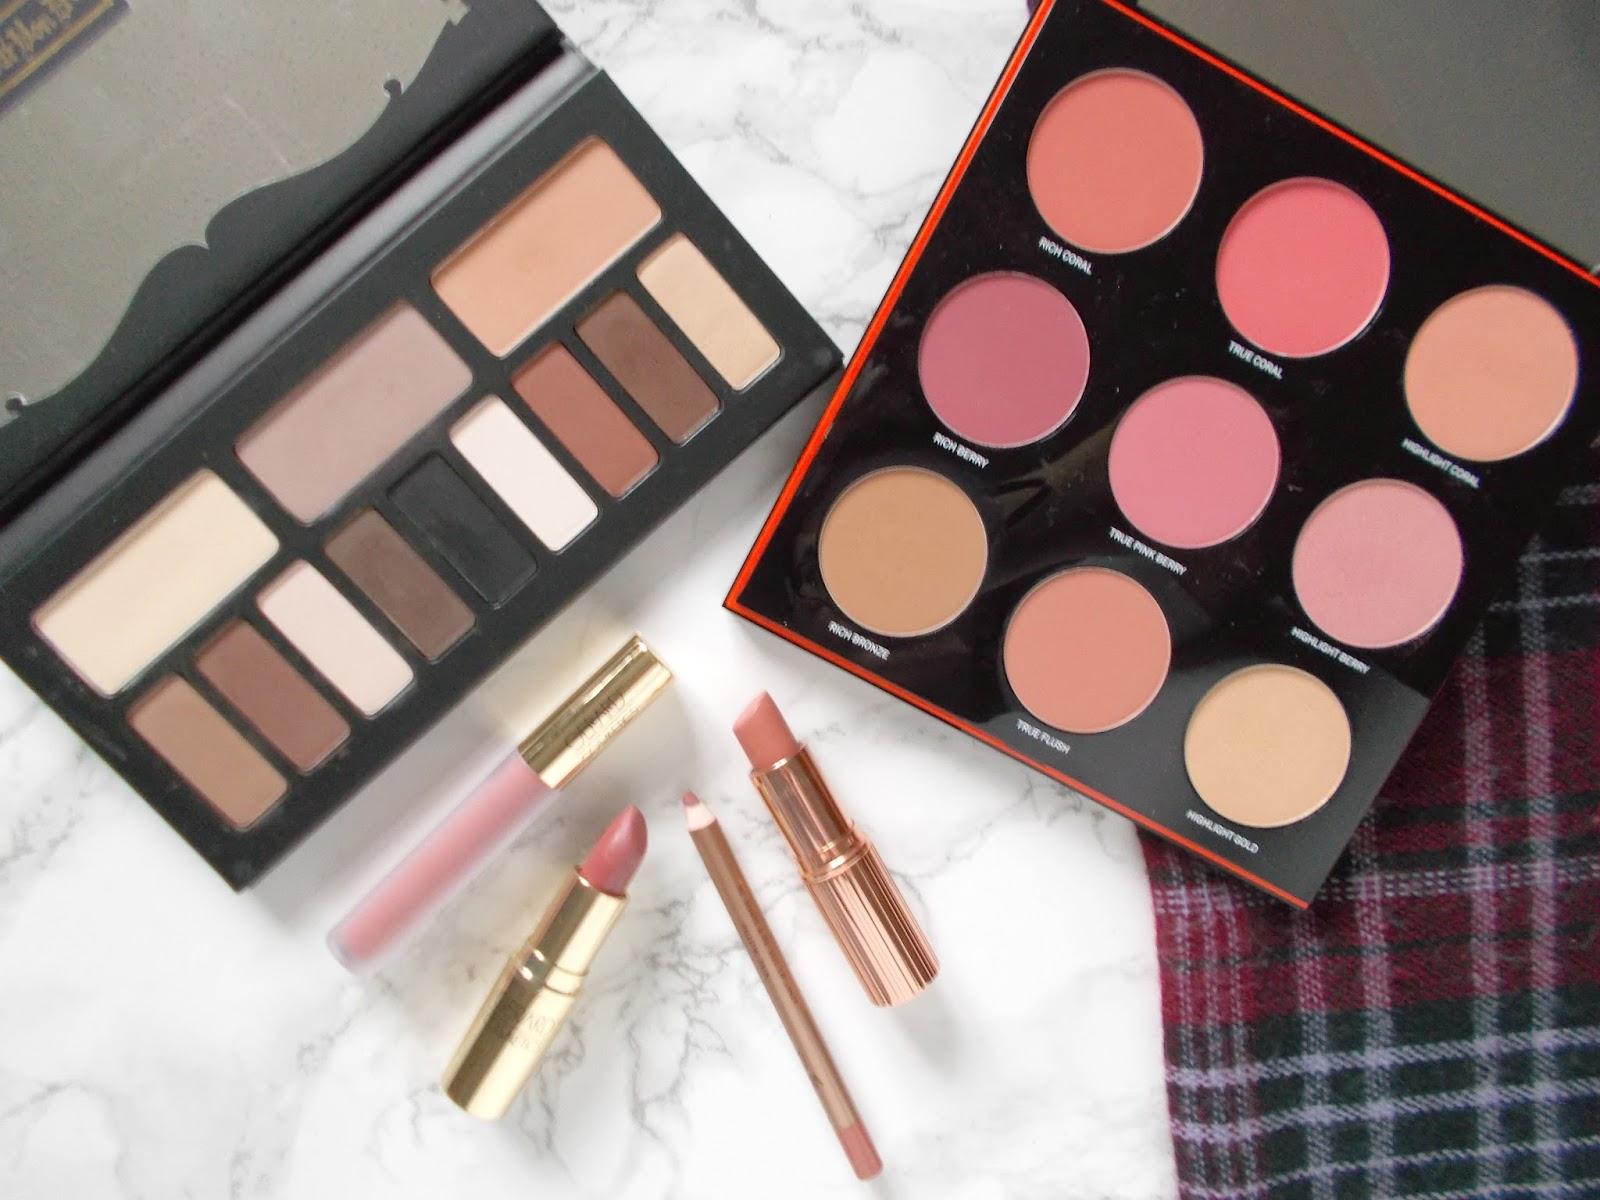 best beauty discoveries 2016 favourites makeup smashbox charlotte tilbury gerard cosmetics kat von d